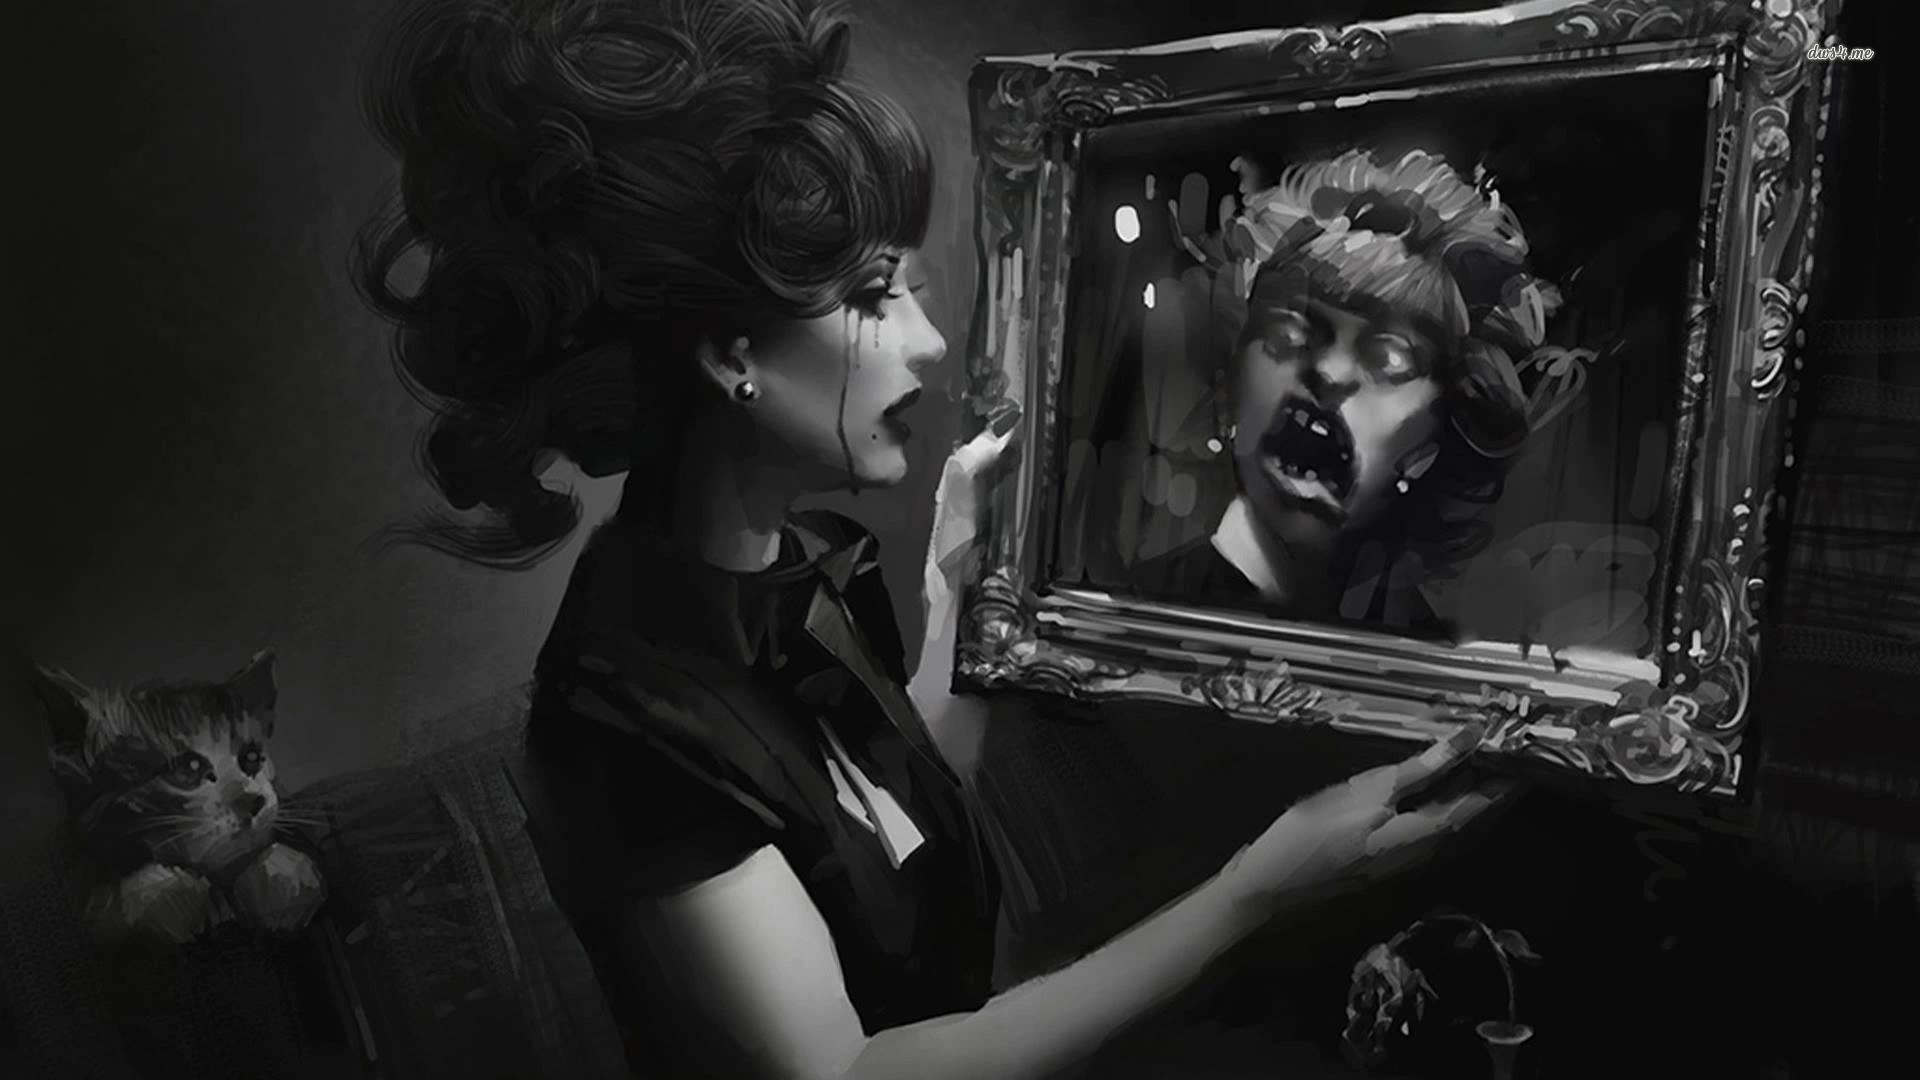 Reflective mirror wallpaper wallpapersafari for Mirror wallpaper